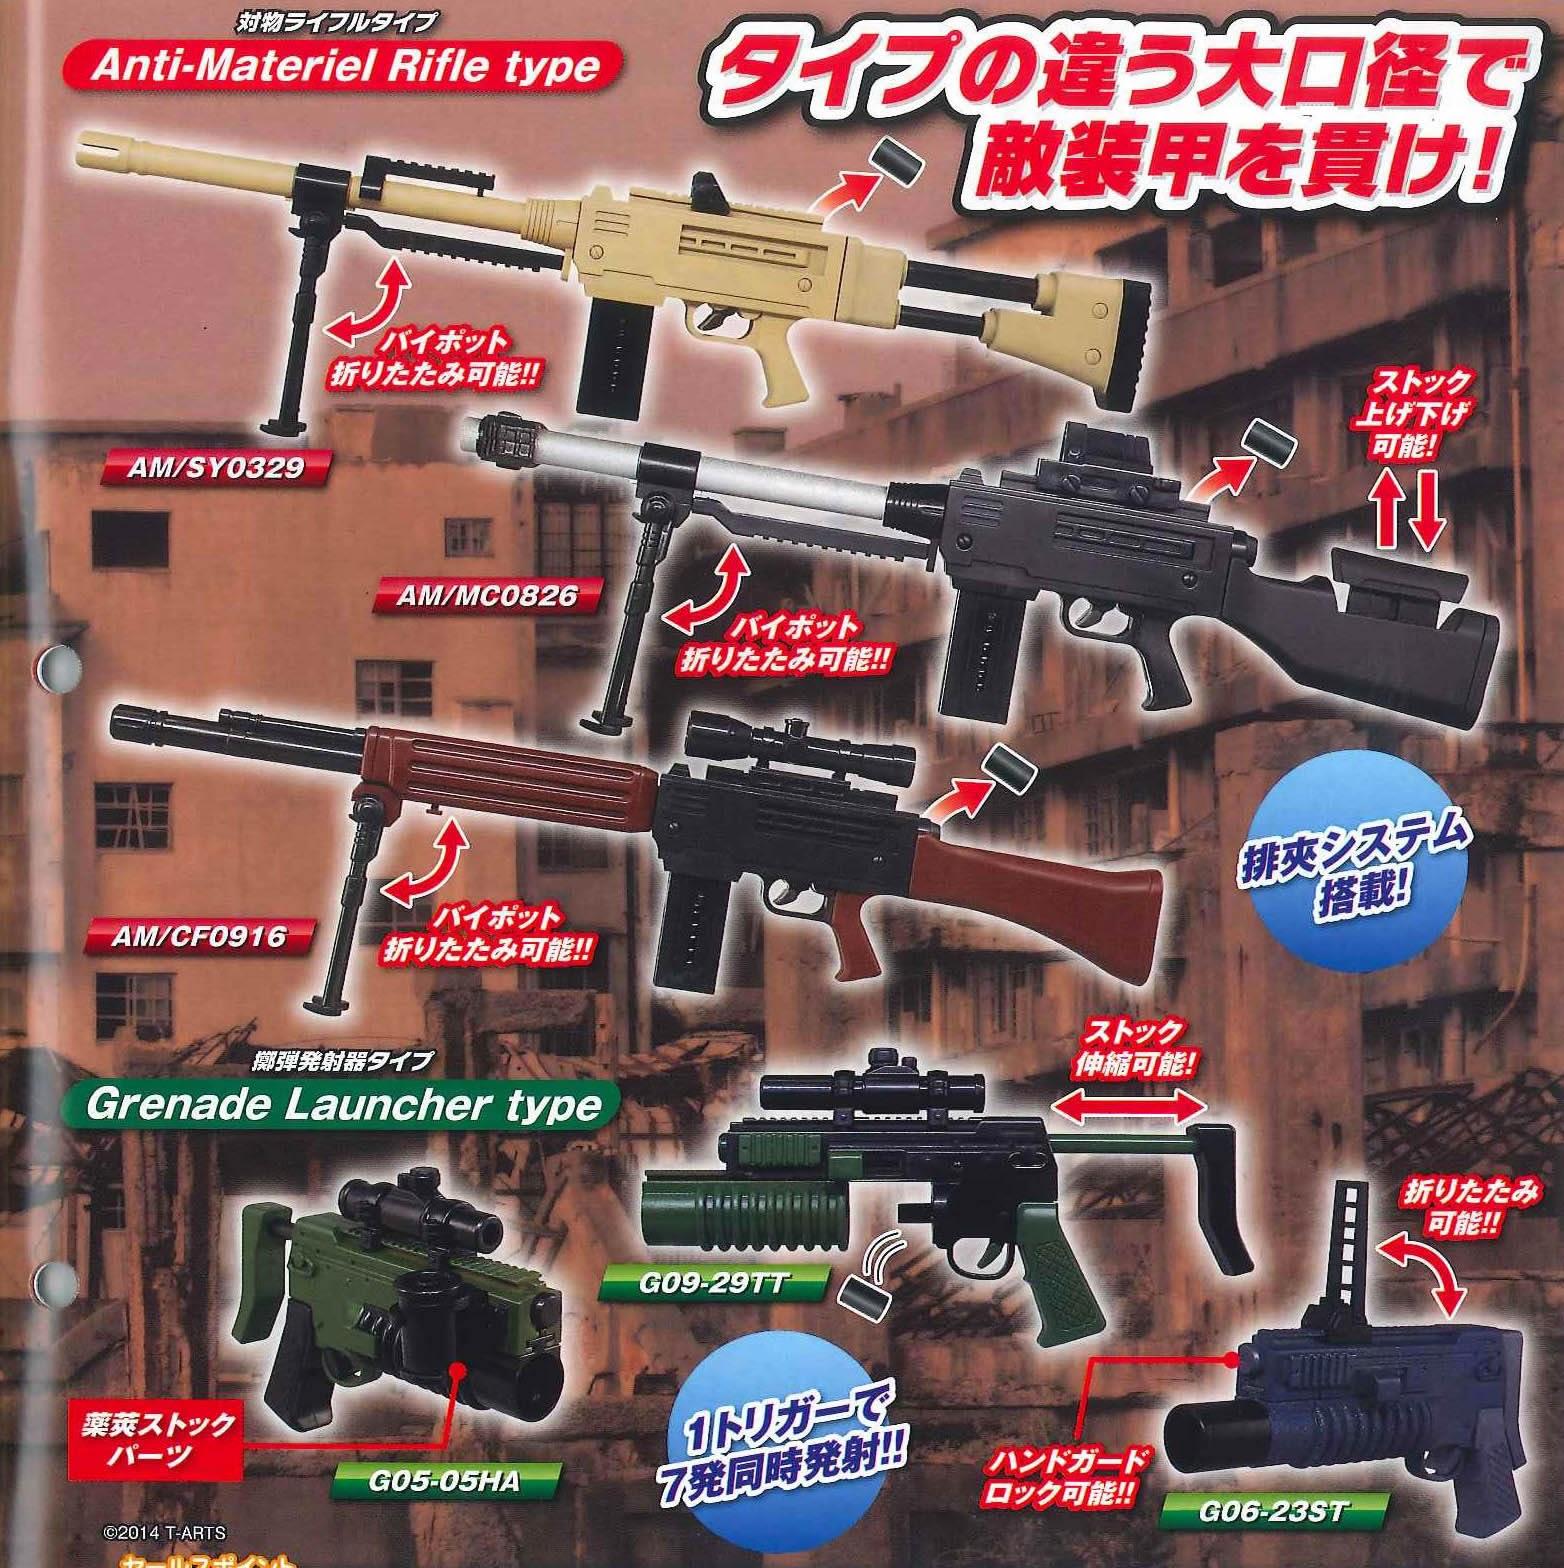 Takara Tomy Anti-Materiel Rifle Type SP6